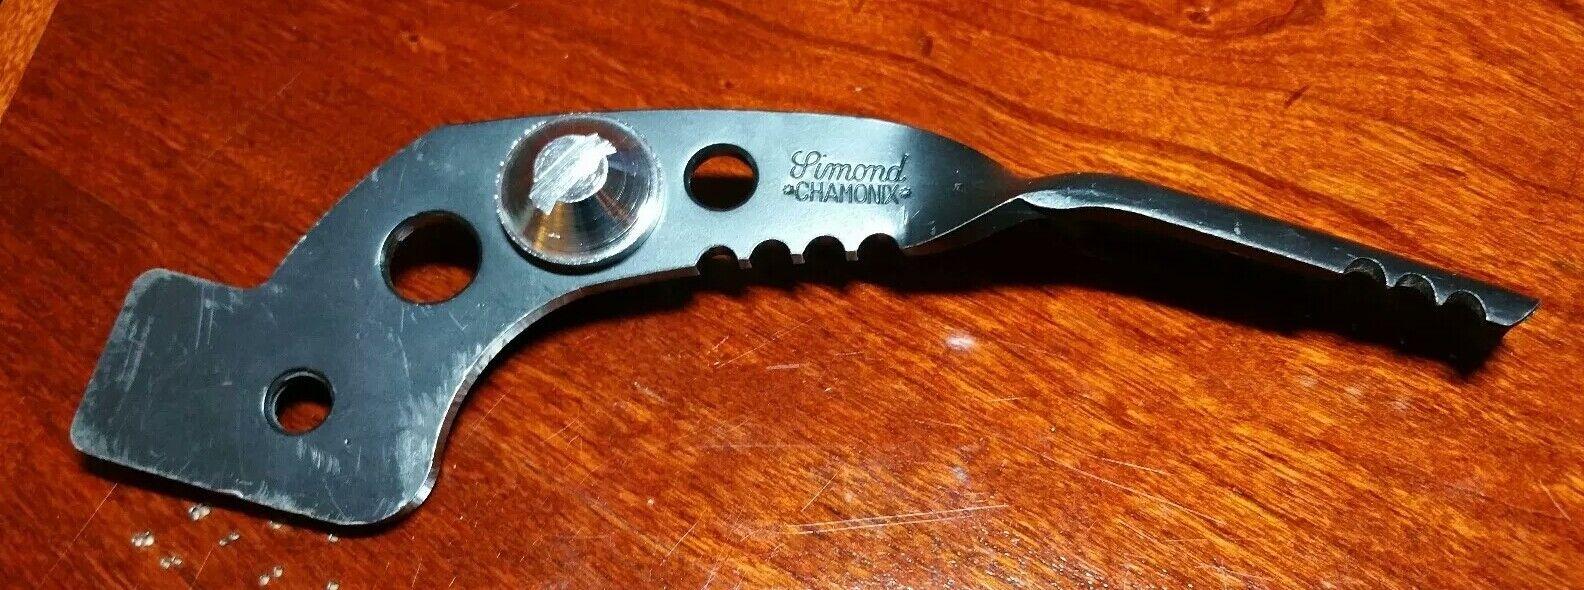 Claudius Simond  Simond Chamonix  Ice Axe Tool   new exclusive high-end